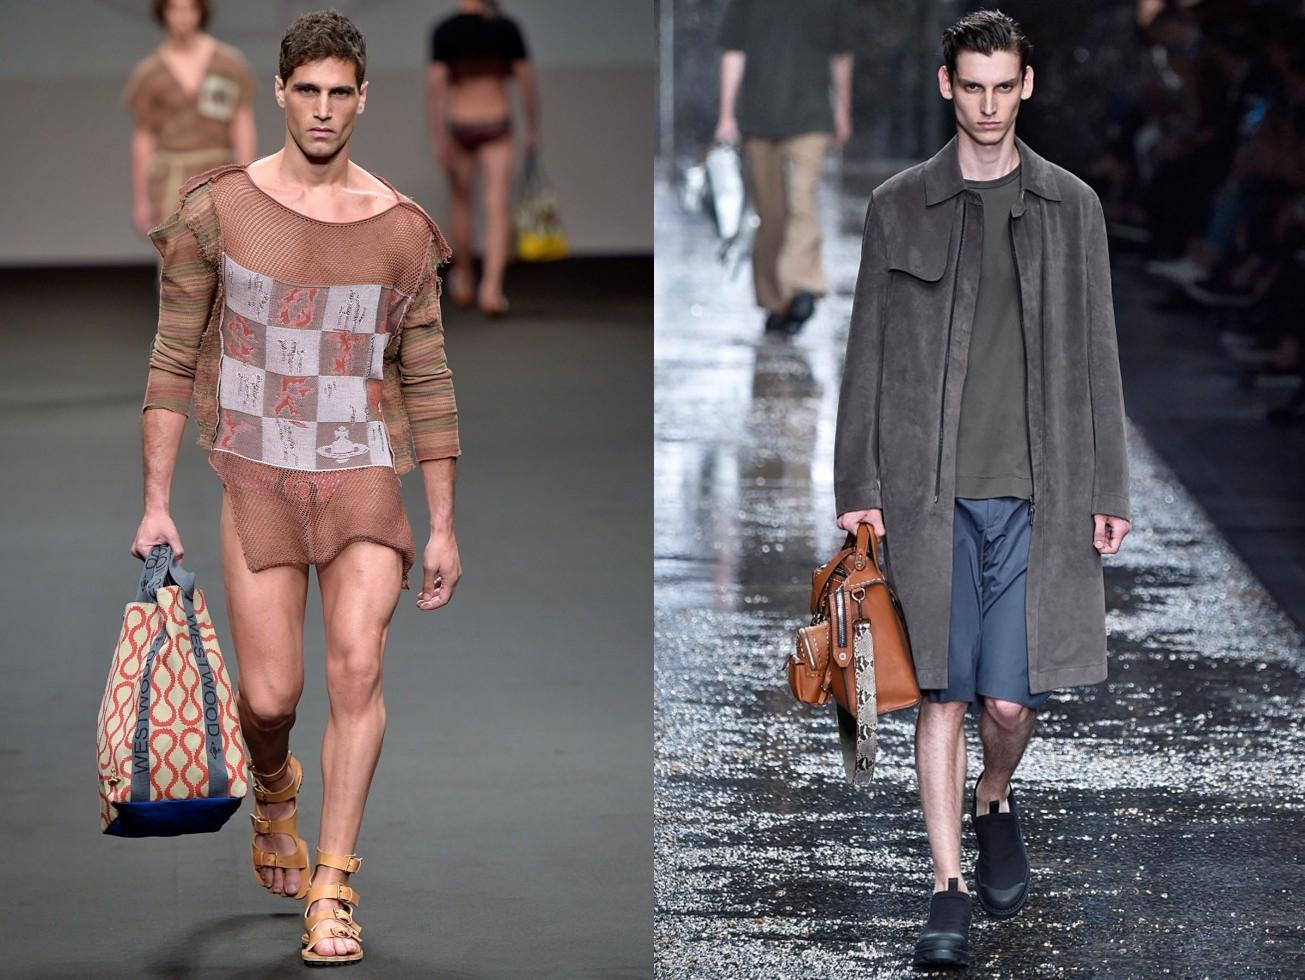 tendencia masculina, moda masculina, menswear, fashion blogger, blogueiro de moda, milan fashion week, trends, verão 2016, summer 2016, alex cursino, moda sem censura, 4